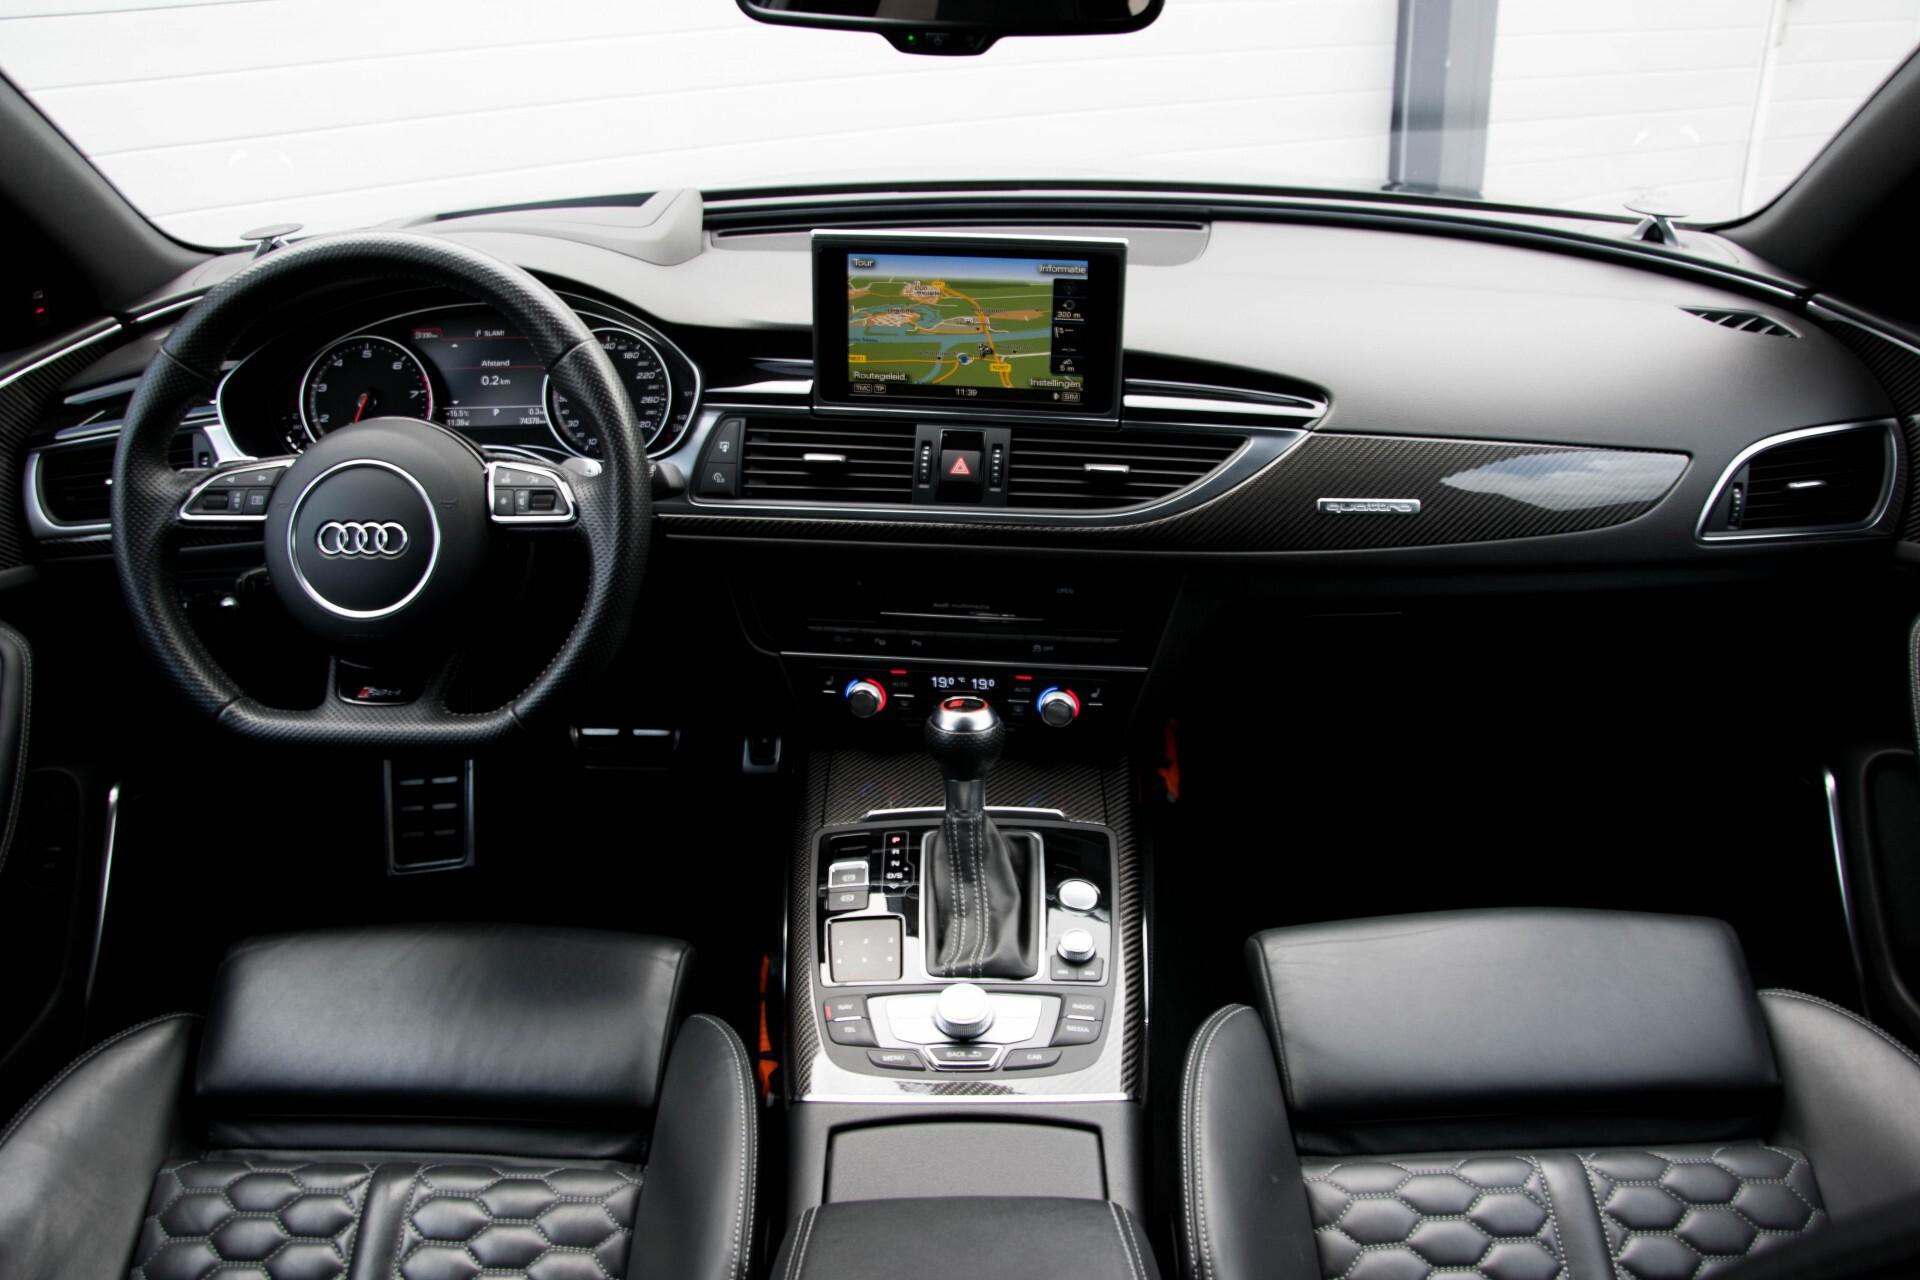 Audi RS6 Avant 4.0 TFSI Quattro B&O/Carbon/Head-Up/Nachtzicht/Exclusive/Camera/Keyless/Pano Aut8 Foto 8